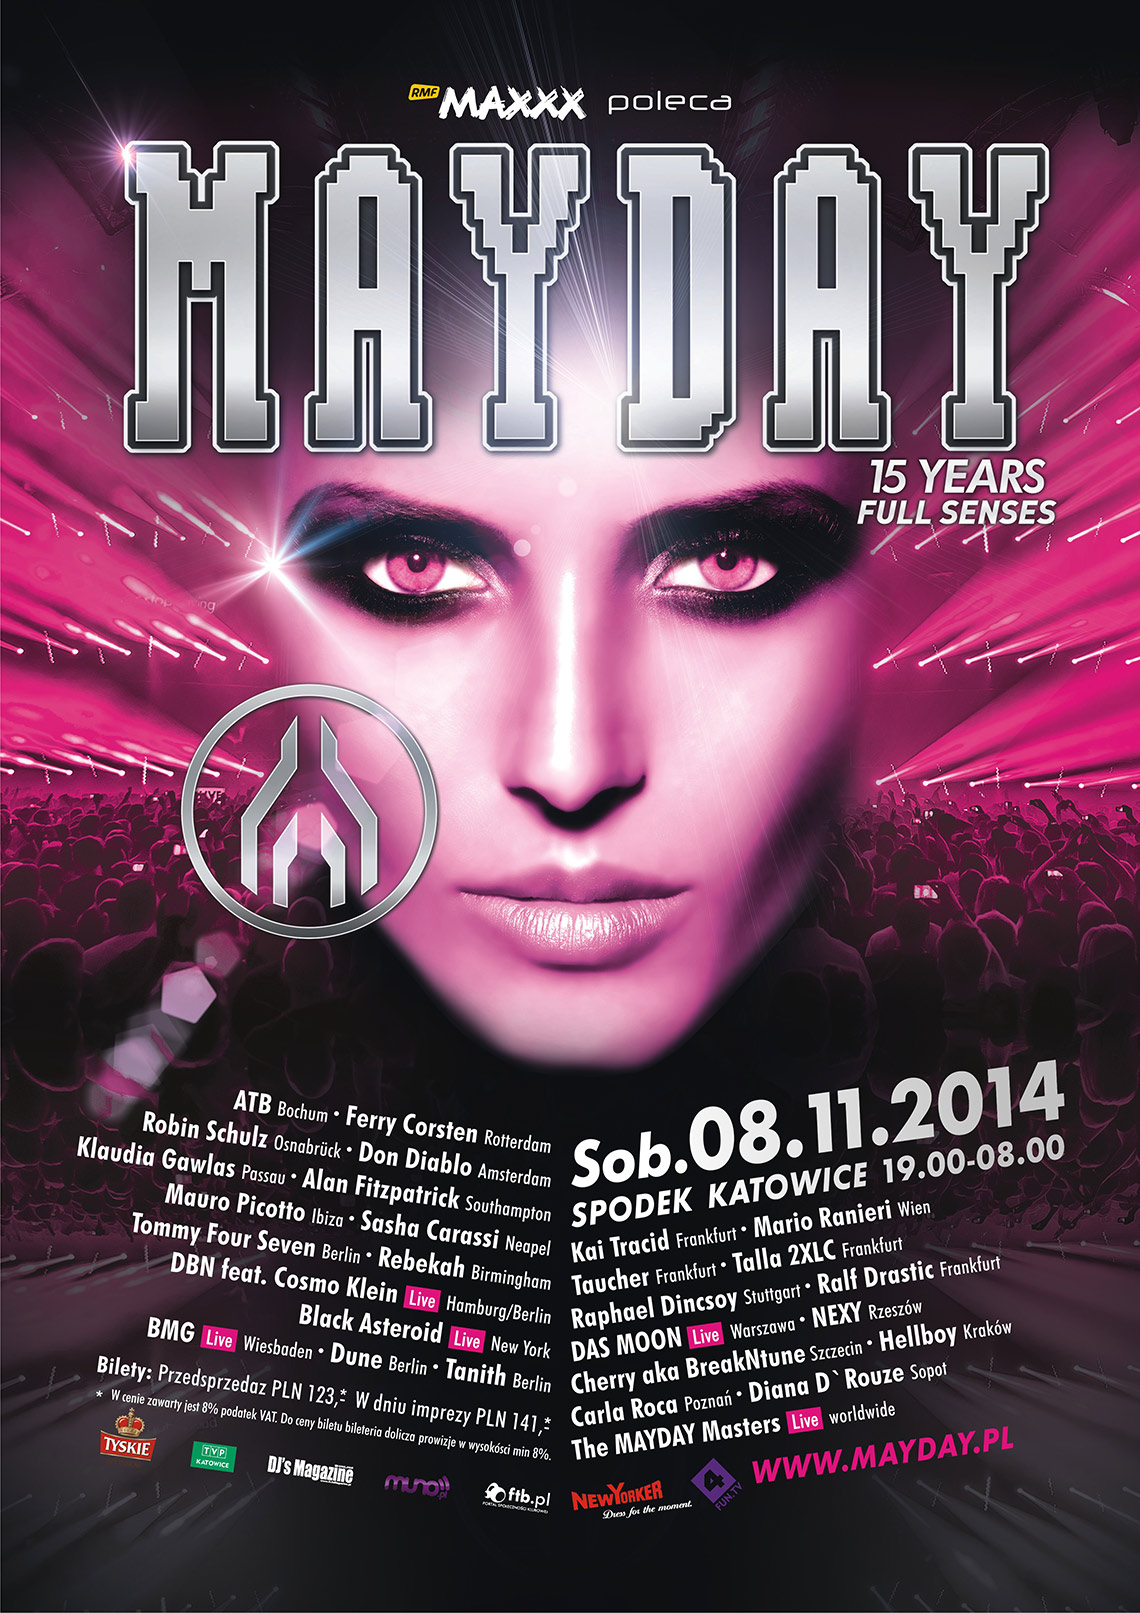 Mayday Poland 2014, Katowice, Poland (08.11.2014) Lineup